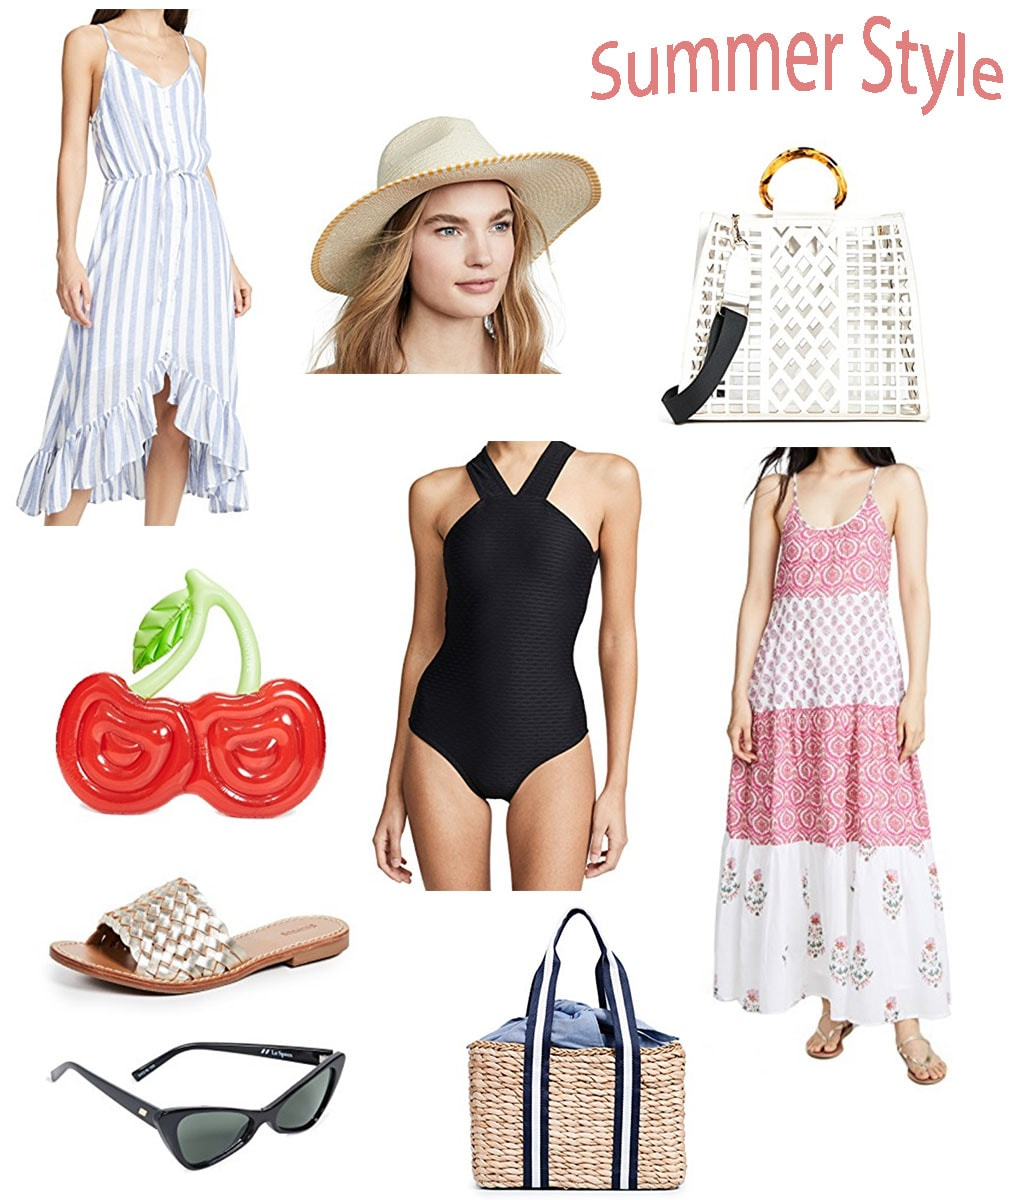 Shopbop Summer Style